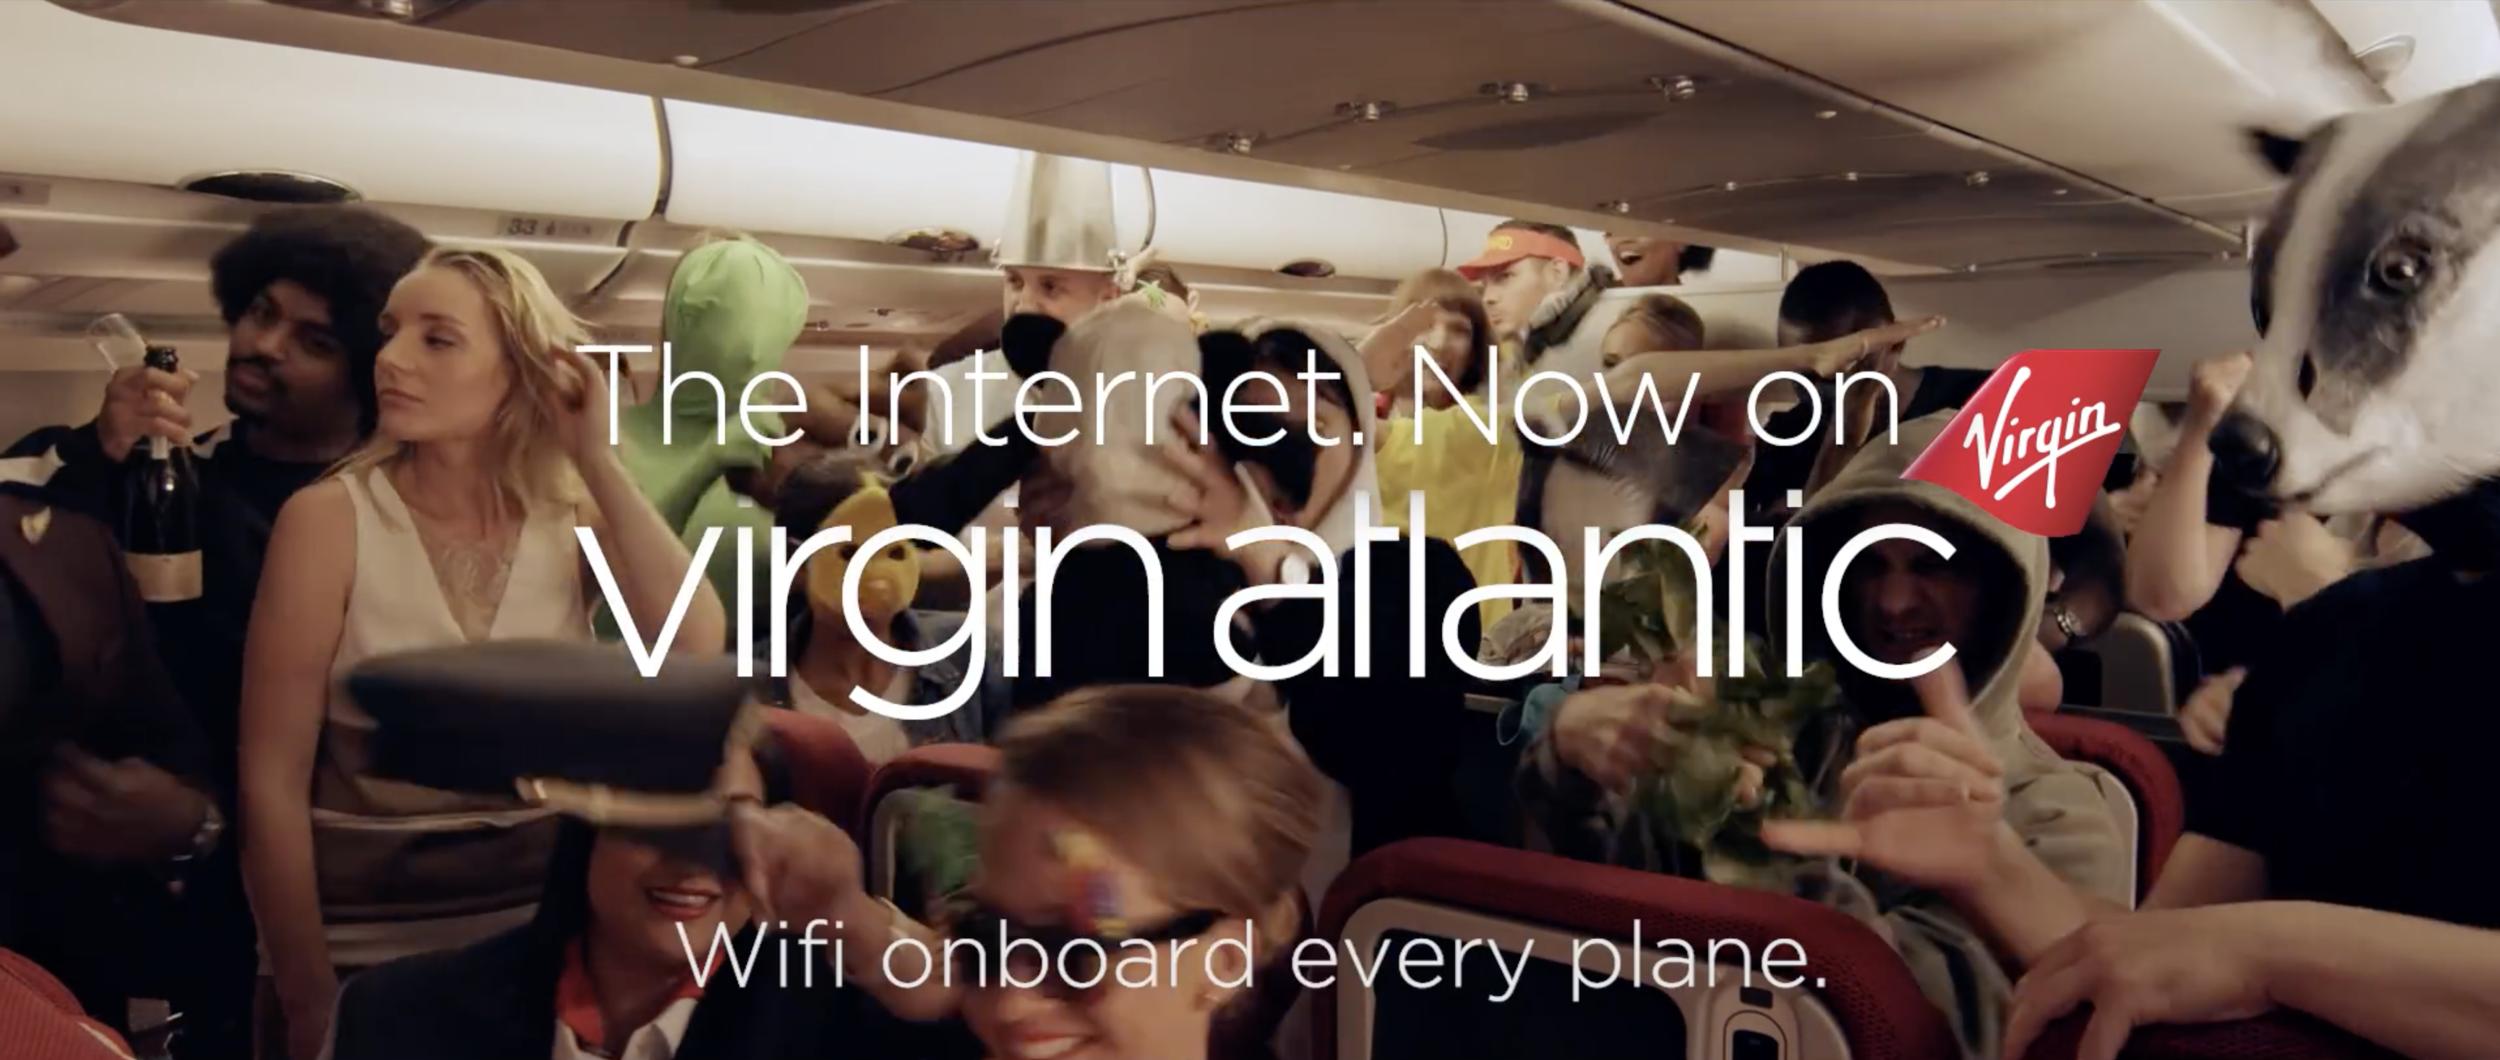 virgin atlantic //  wifi onboard    steadicam operator   Director - jamie m ffinch dop - ed wright